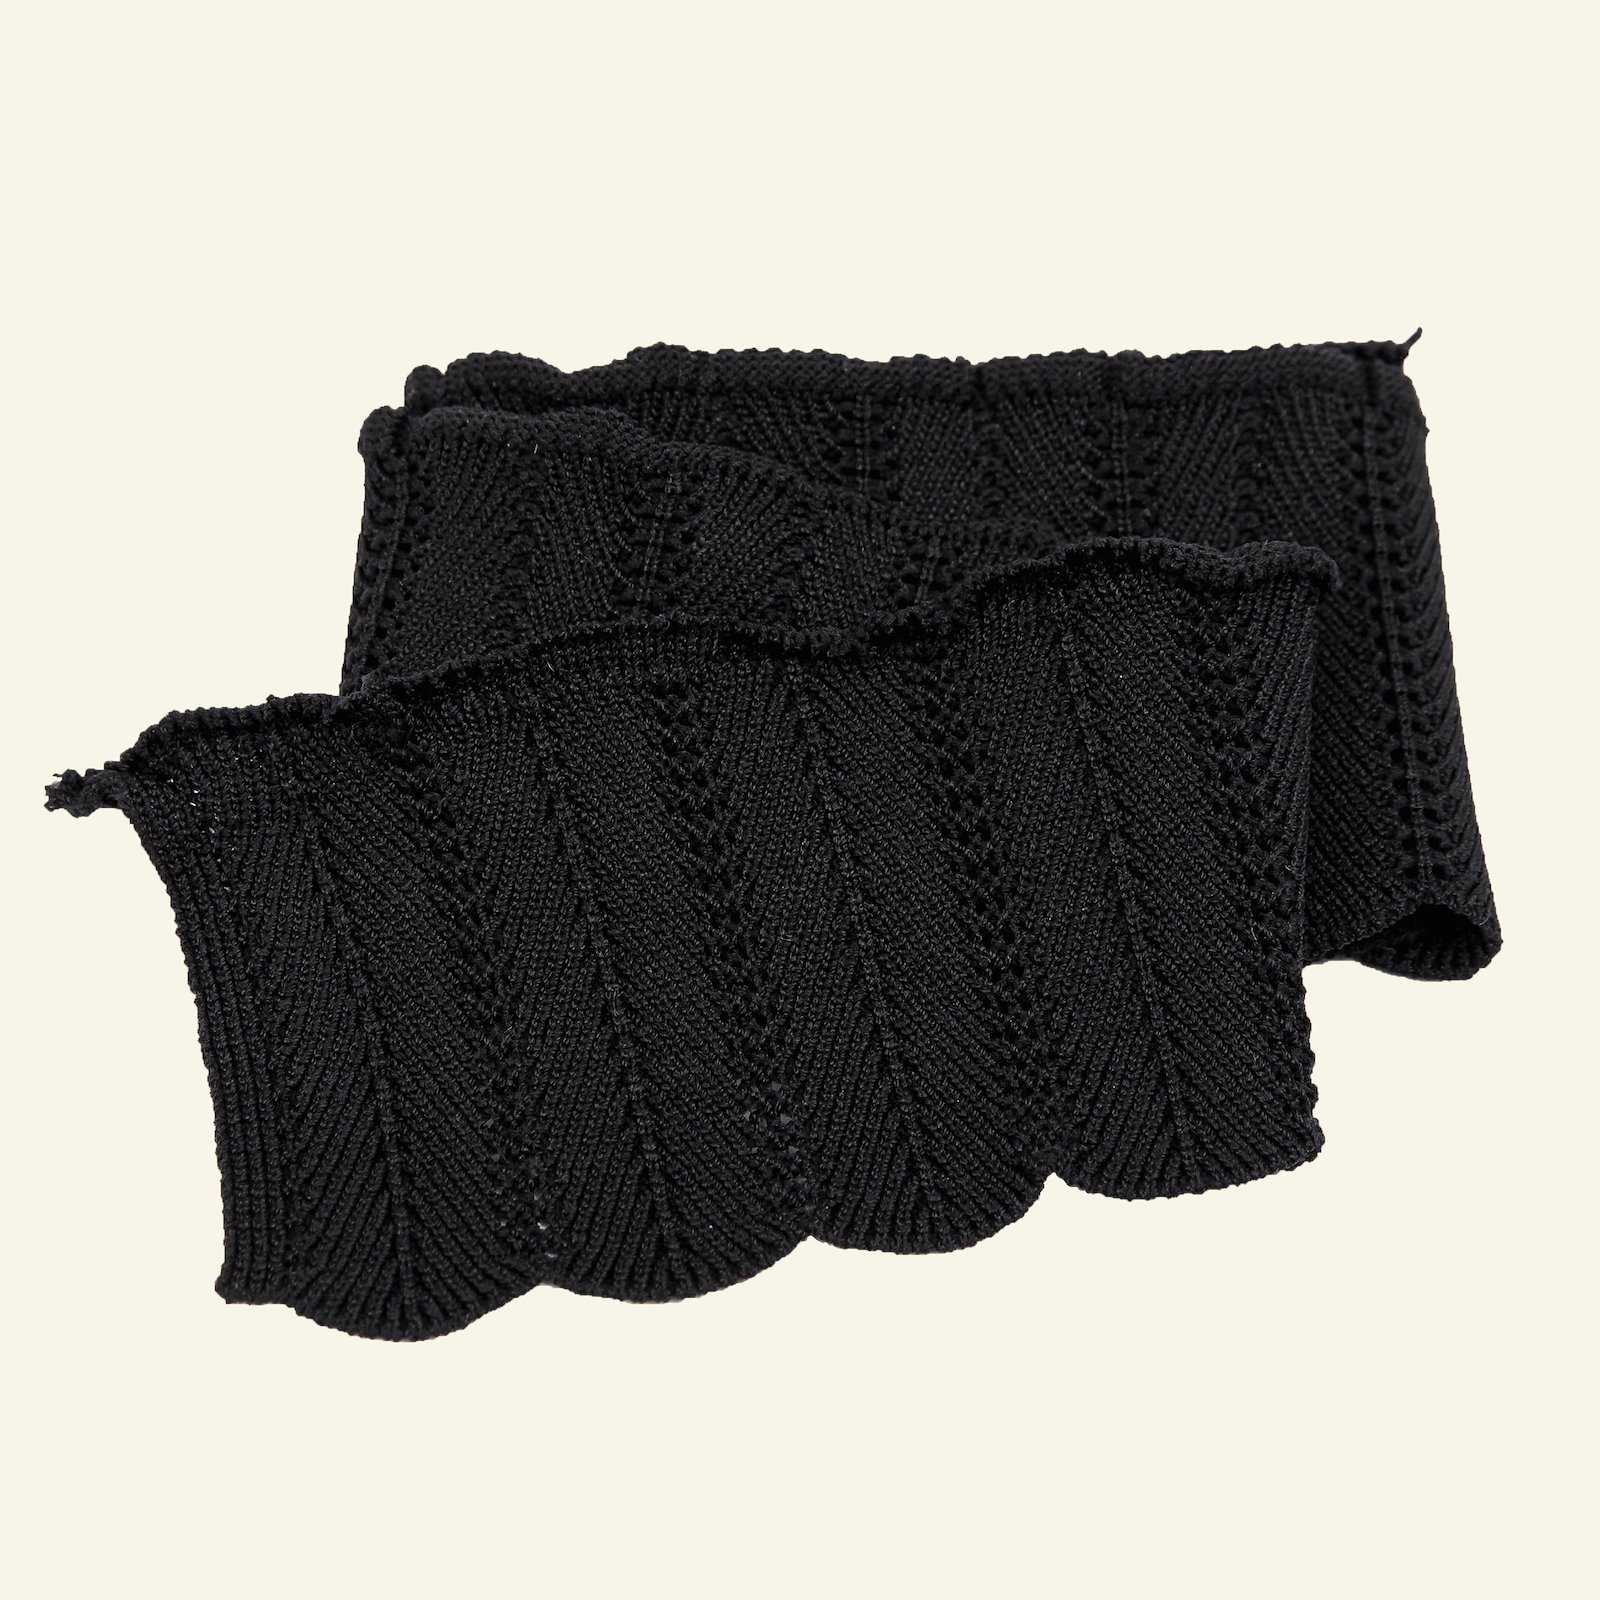 Rib knitted 6x55cm black 1pc 96177_pack